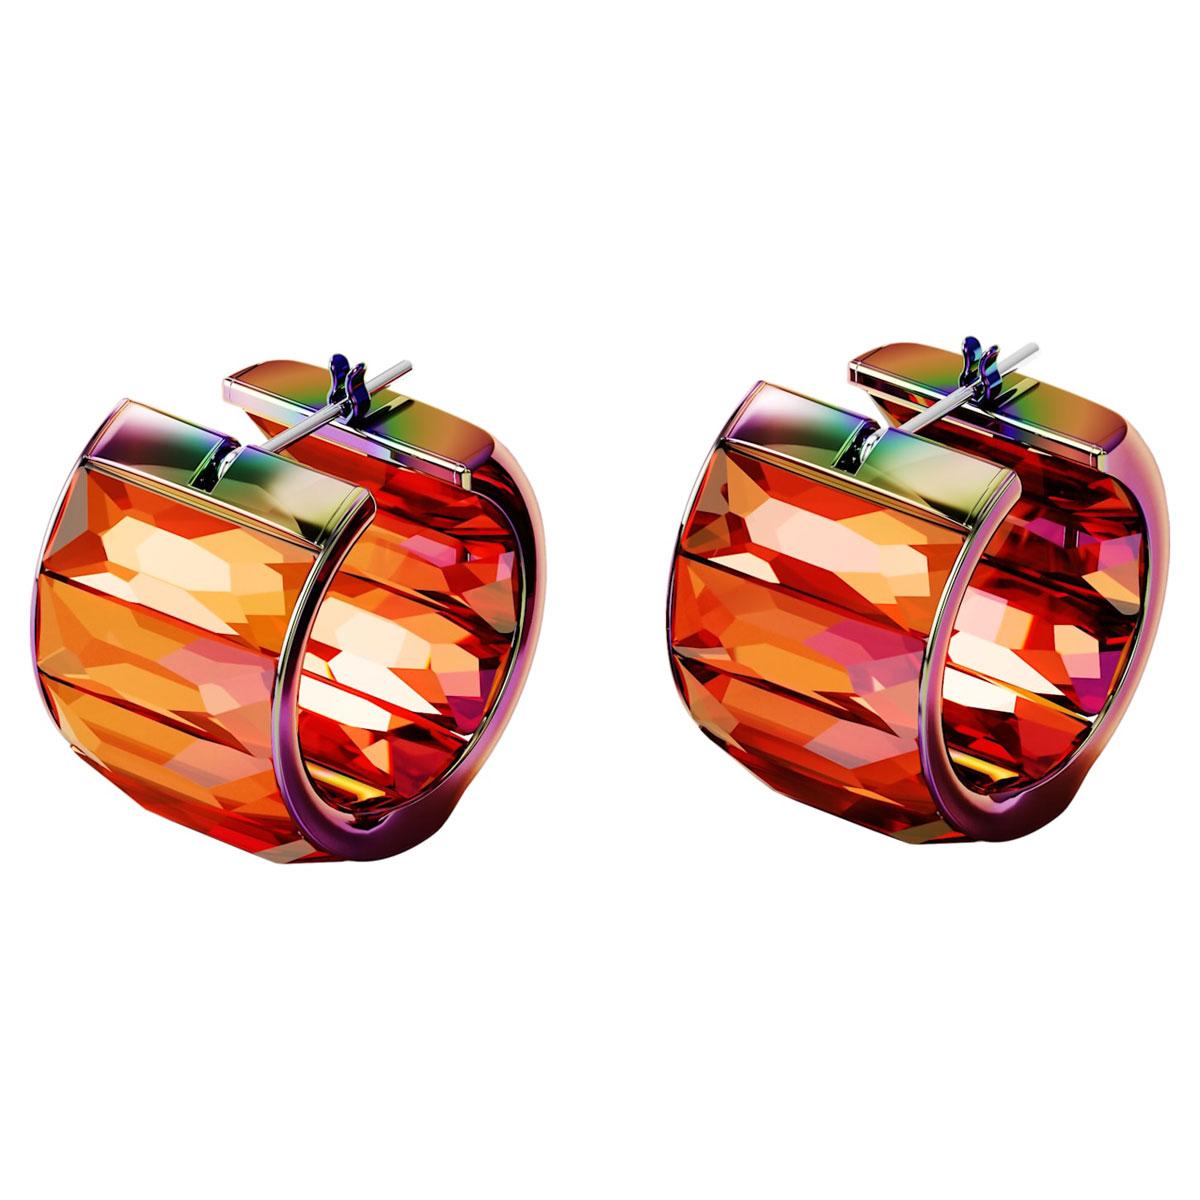 Swarovski Curiosa Earrings, Pink, Pair